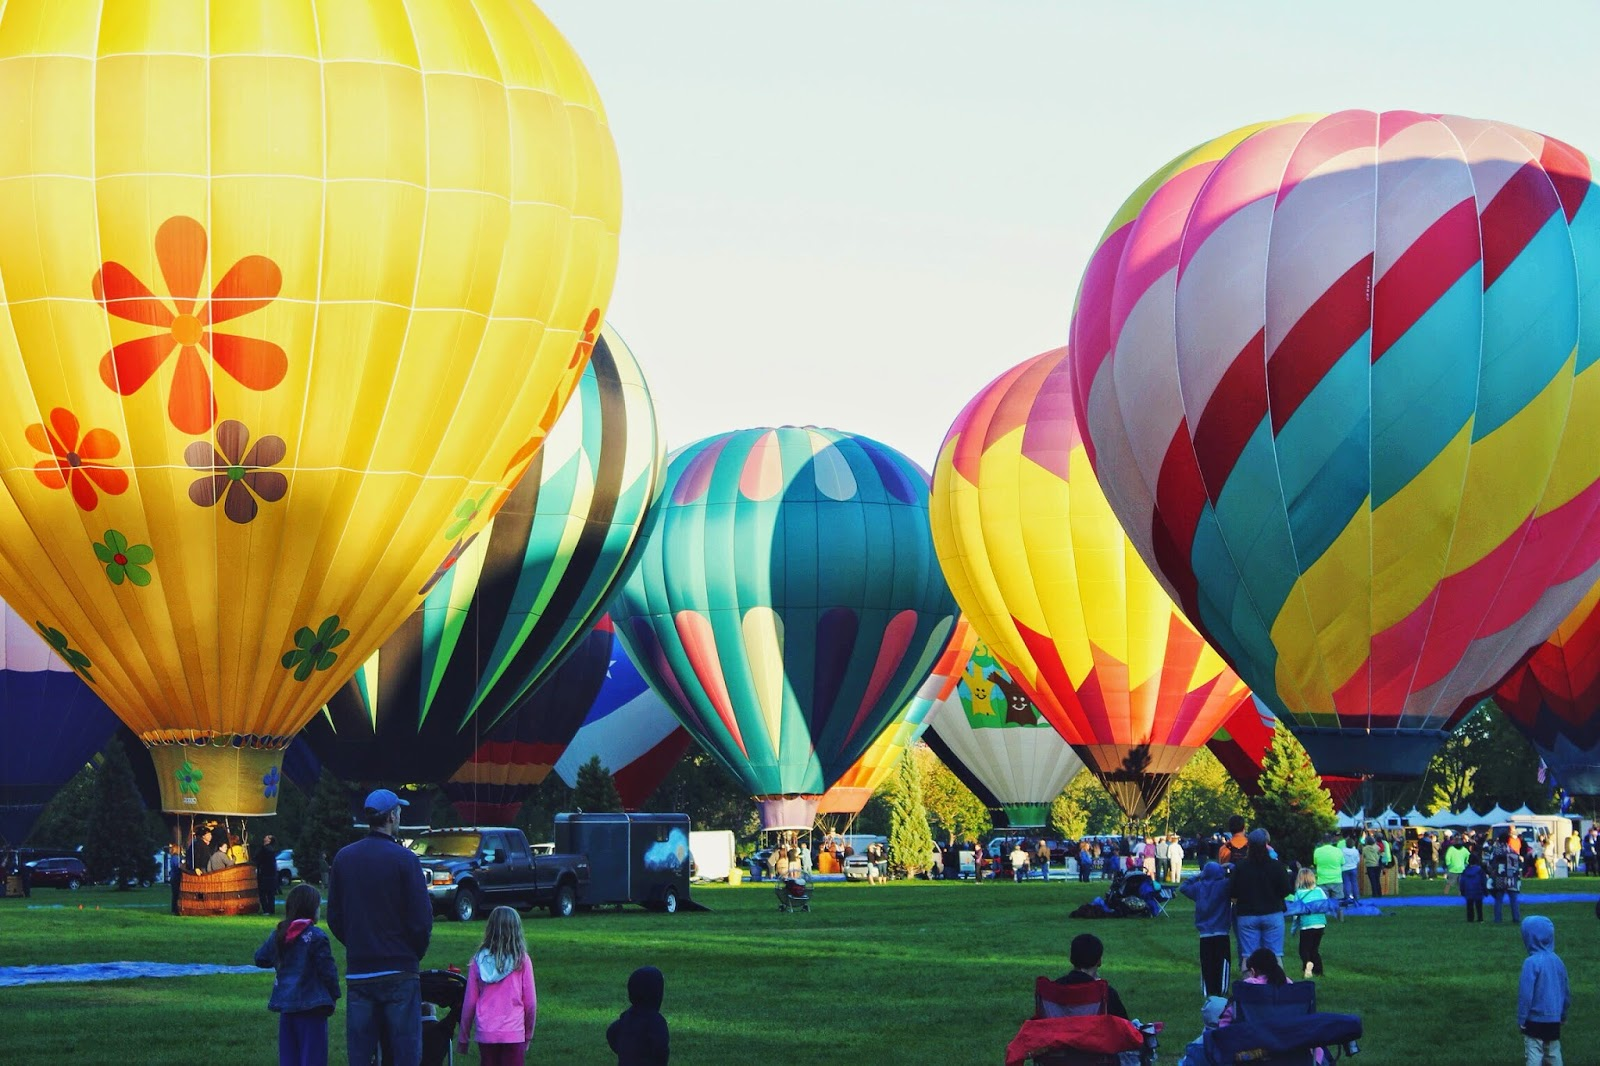 balloons%2Bready%2Bto%2Blaunch.jpg